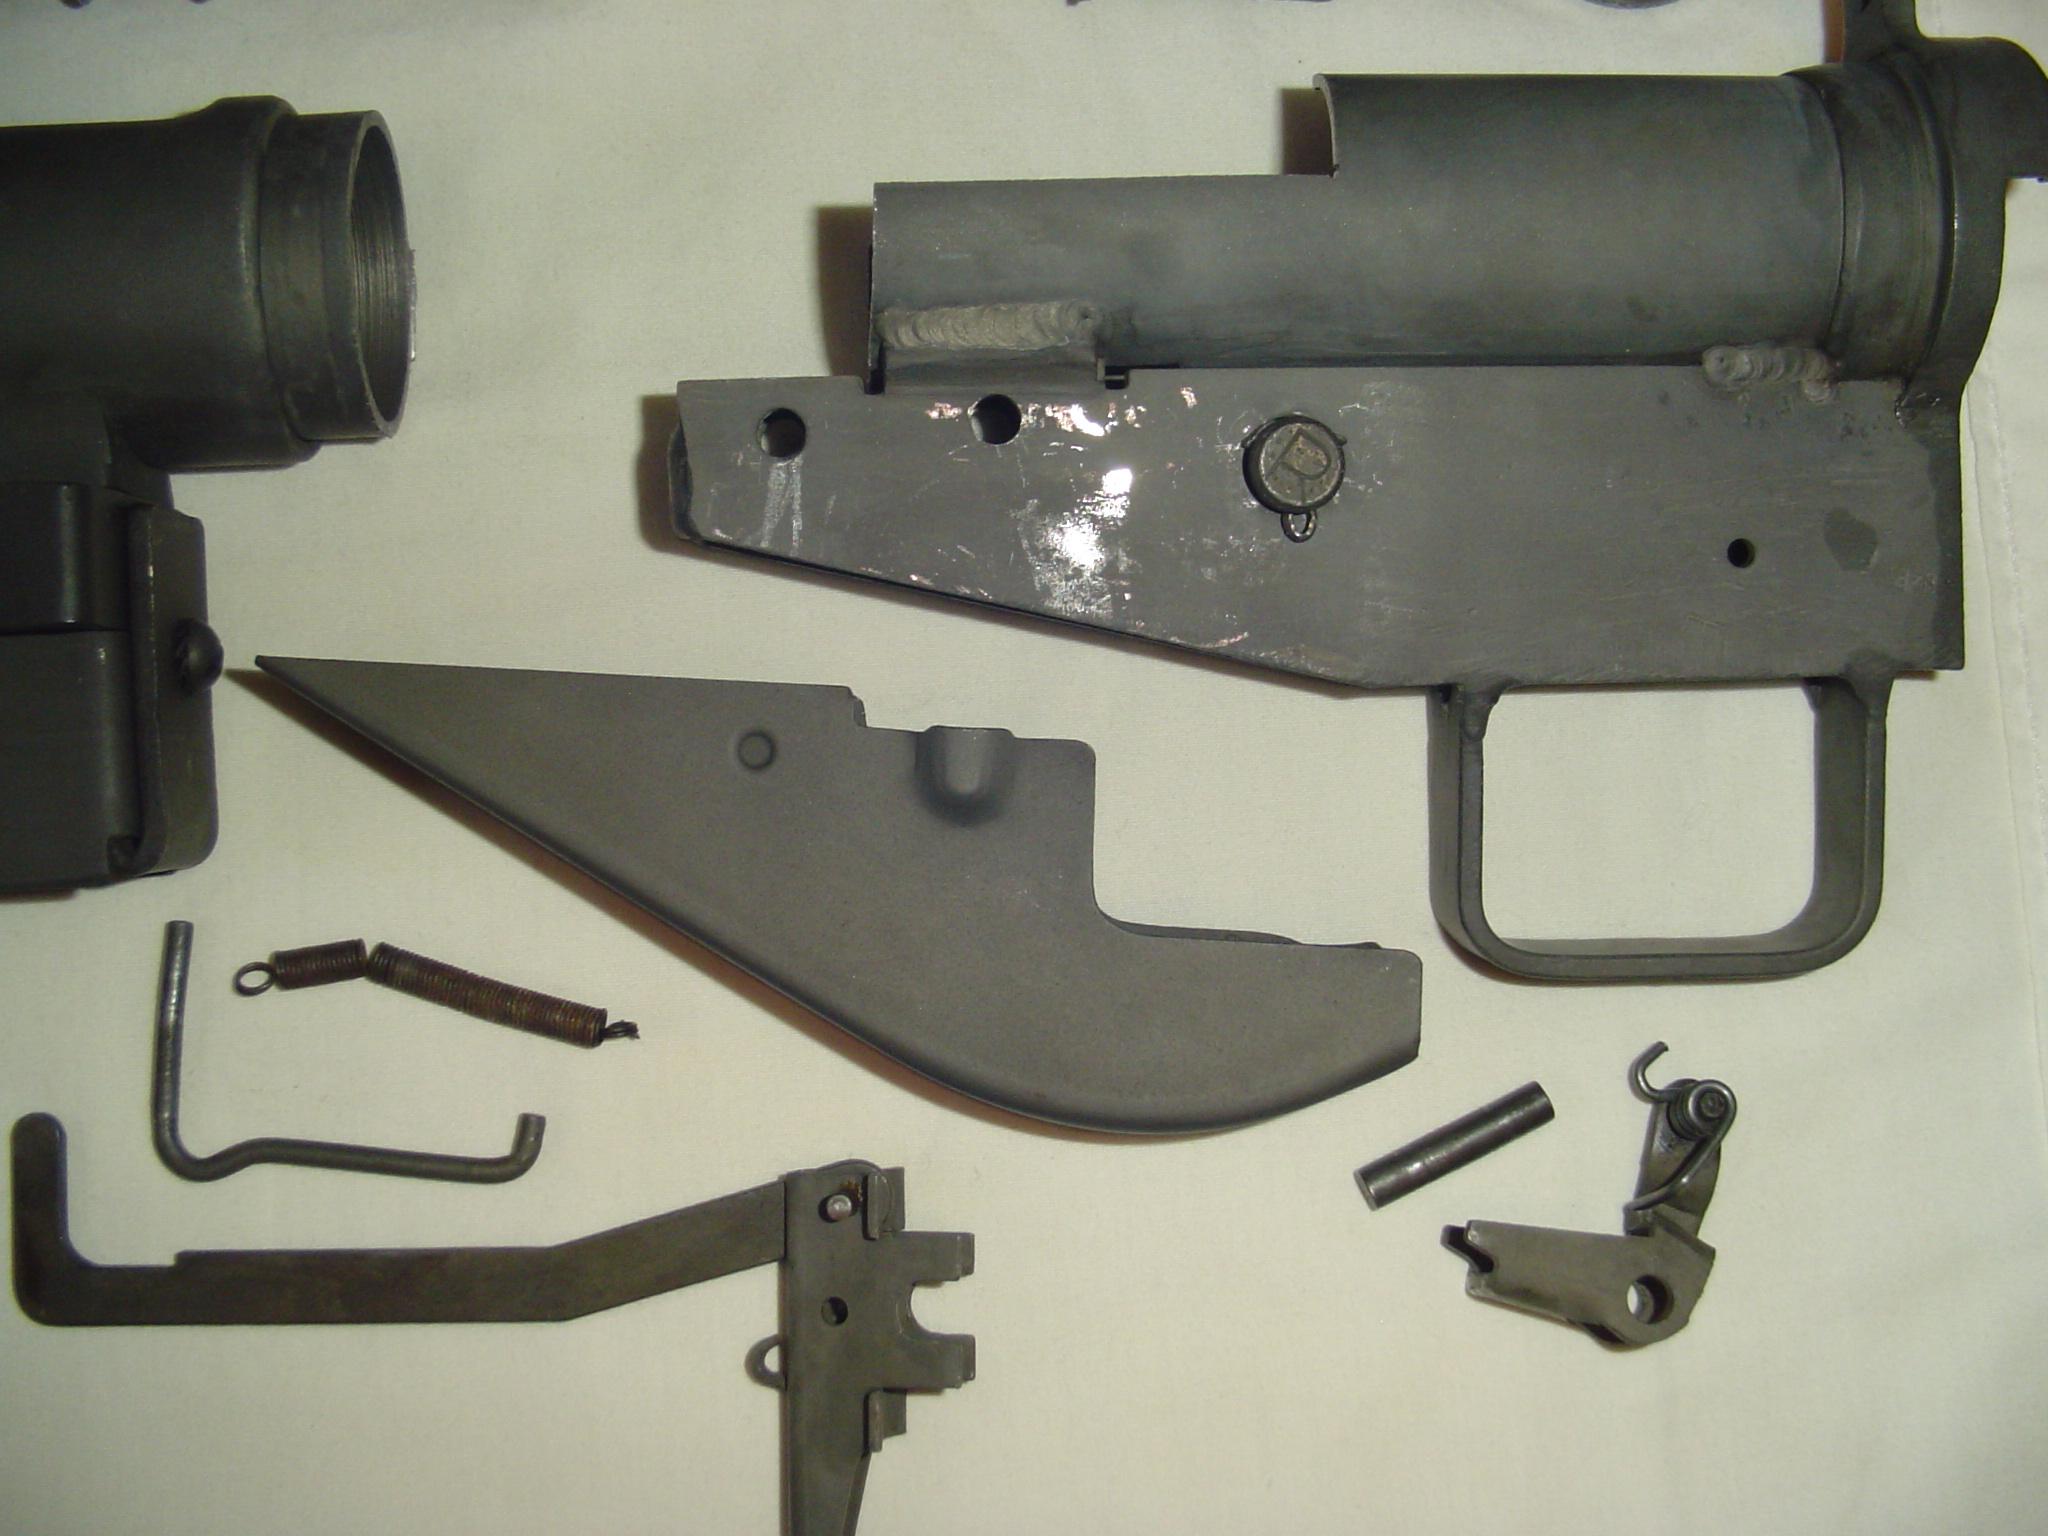 WTS: Sten Mk II parts kit